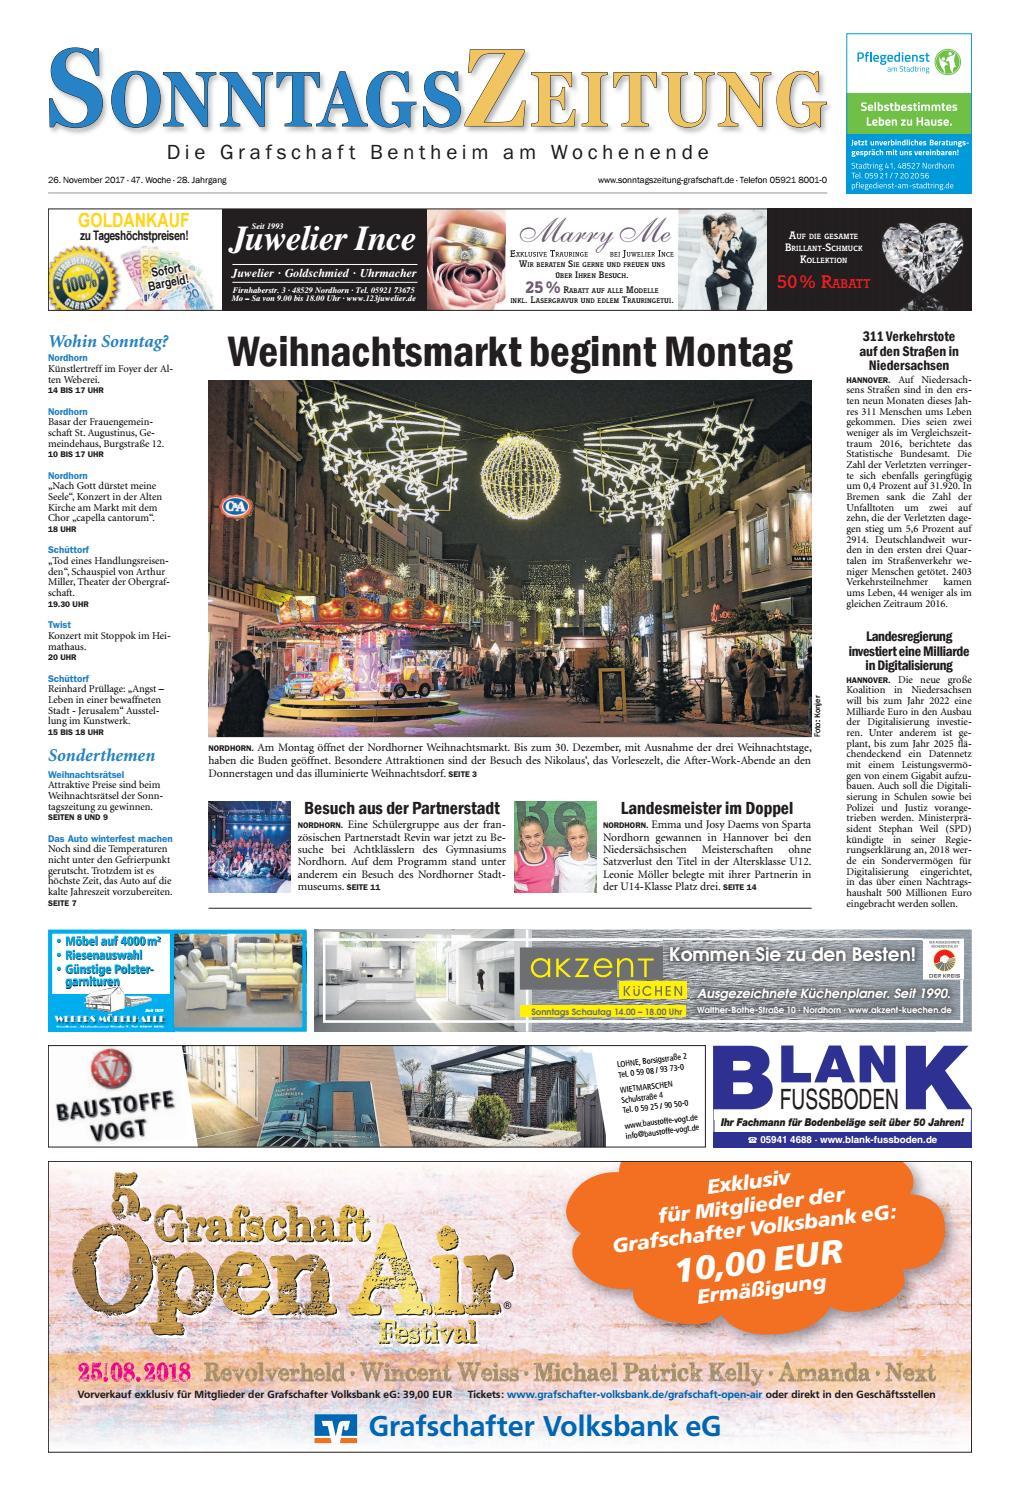 sonntagszeitung 26 11 2017 by